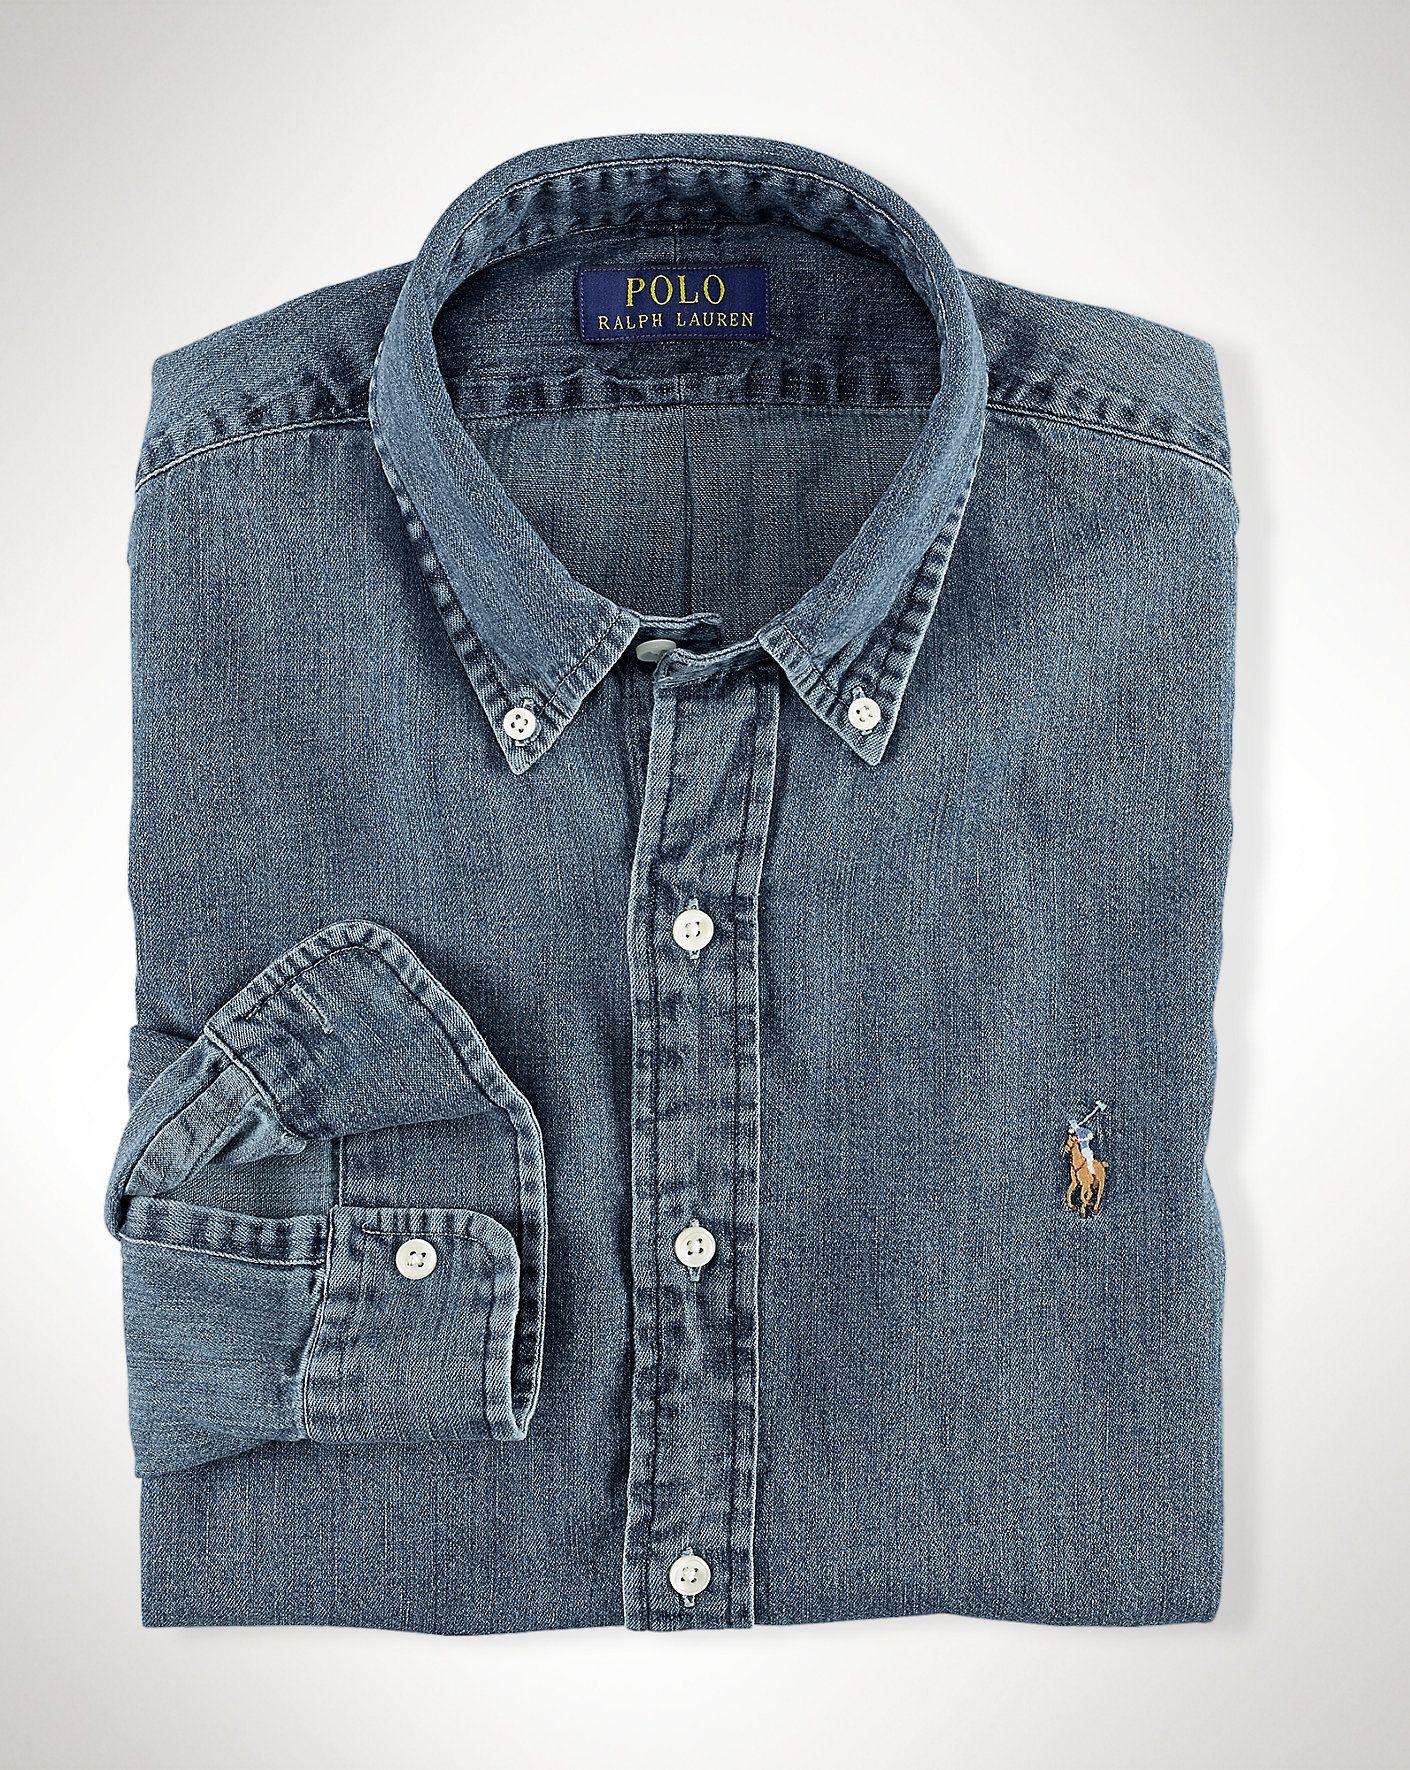 b21a7bfdb5d19 Polo Ralph Lauren - Slim-Fit Denim Shirt XL